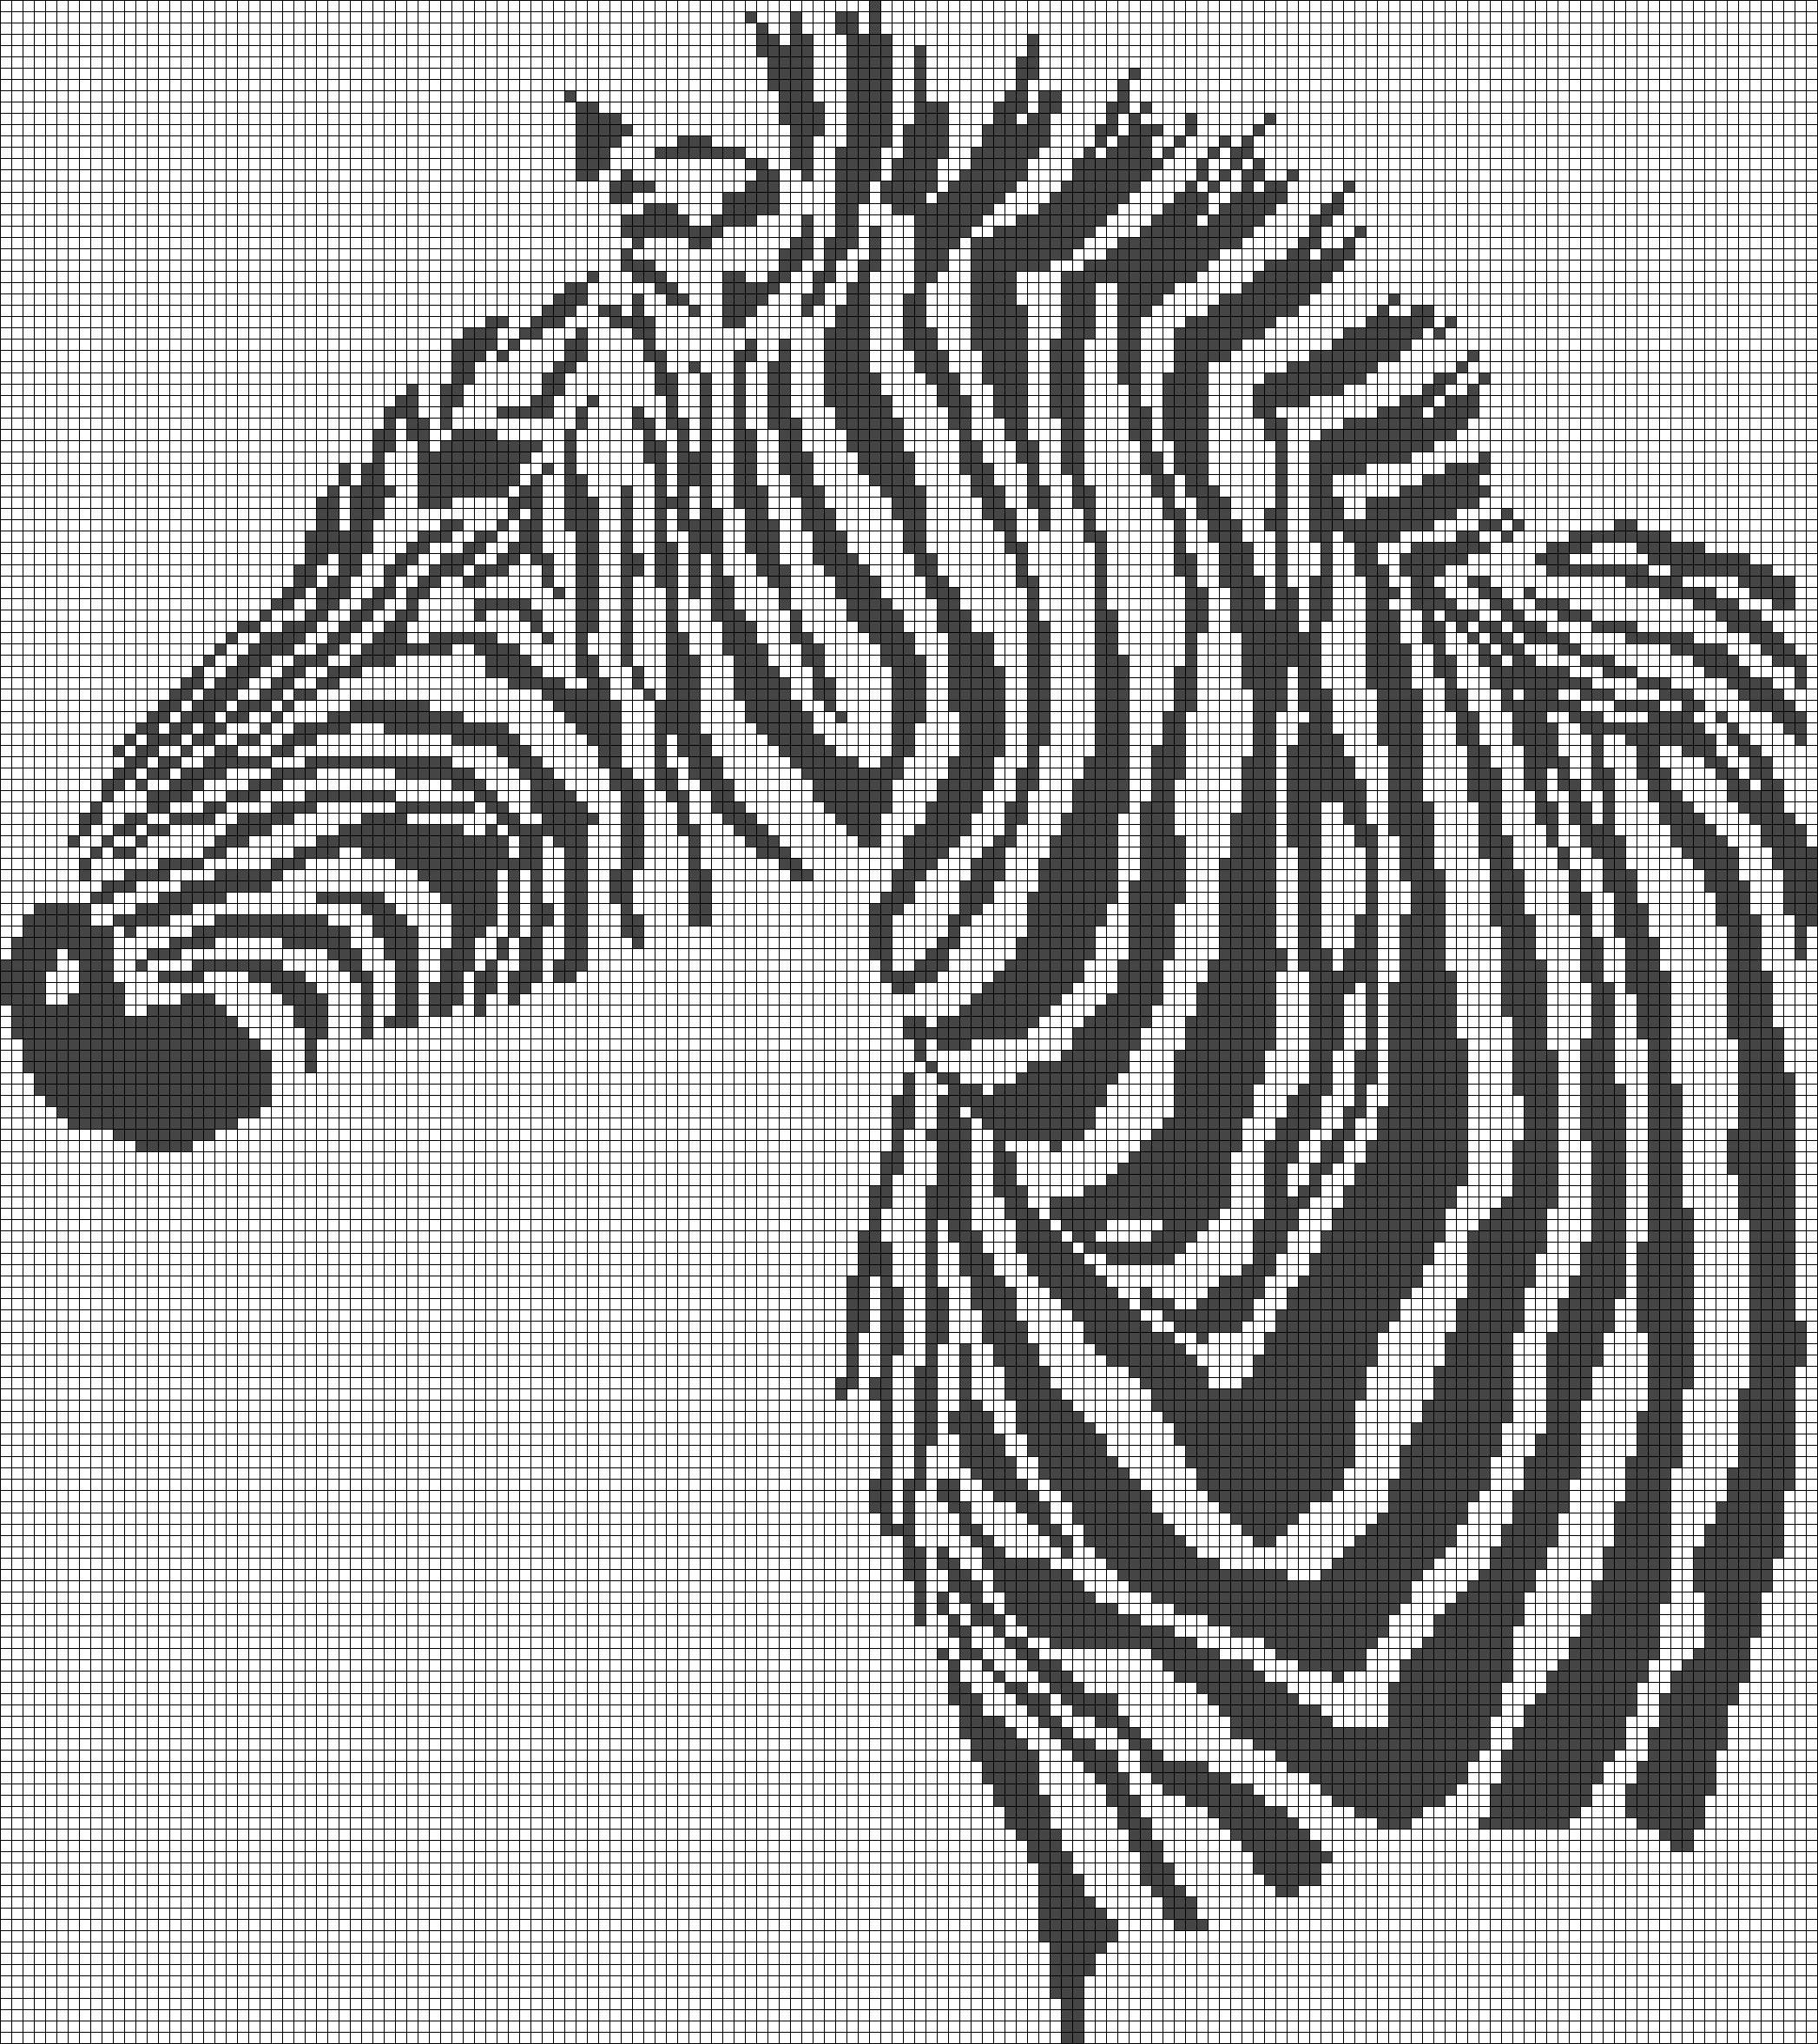 Zebra Pattern Chart For Cross Stitch Crochet Knitting